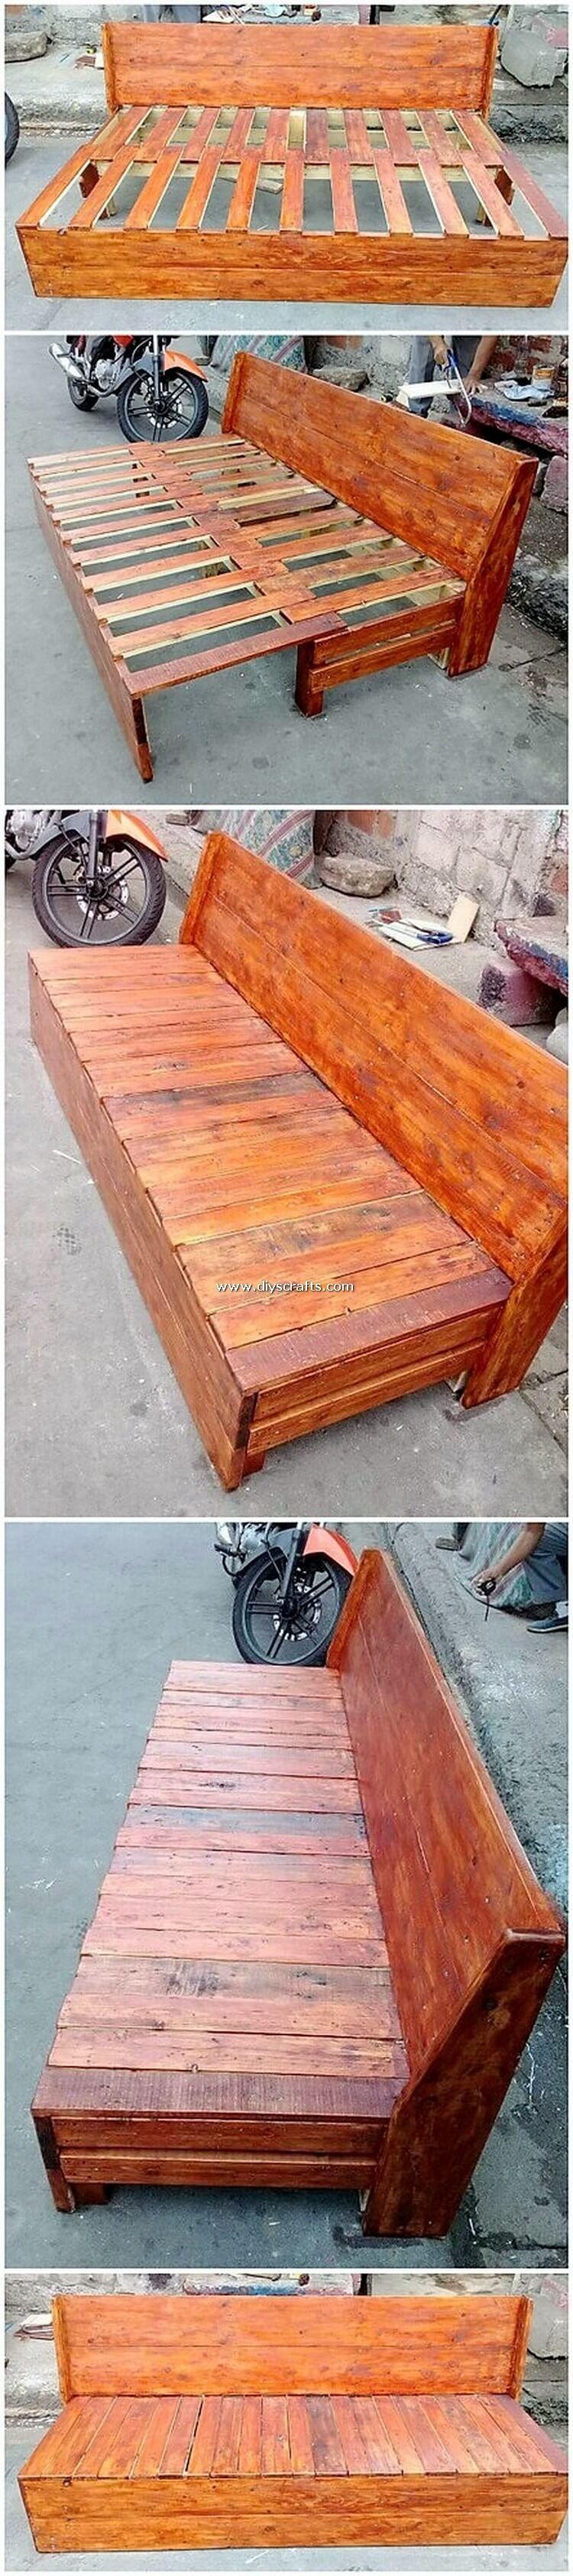 DIY-Pallet-Bench-1